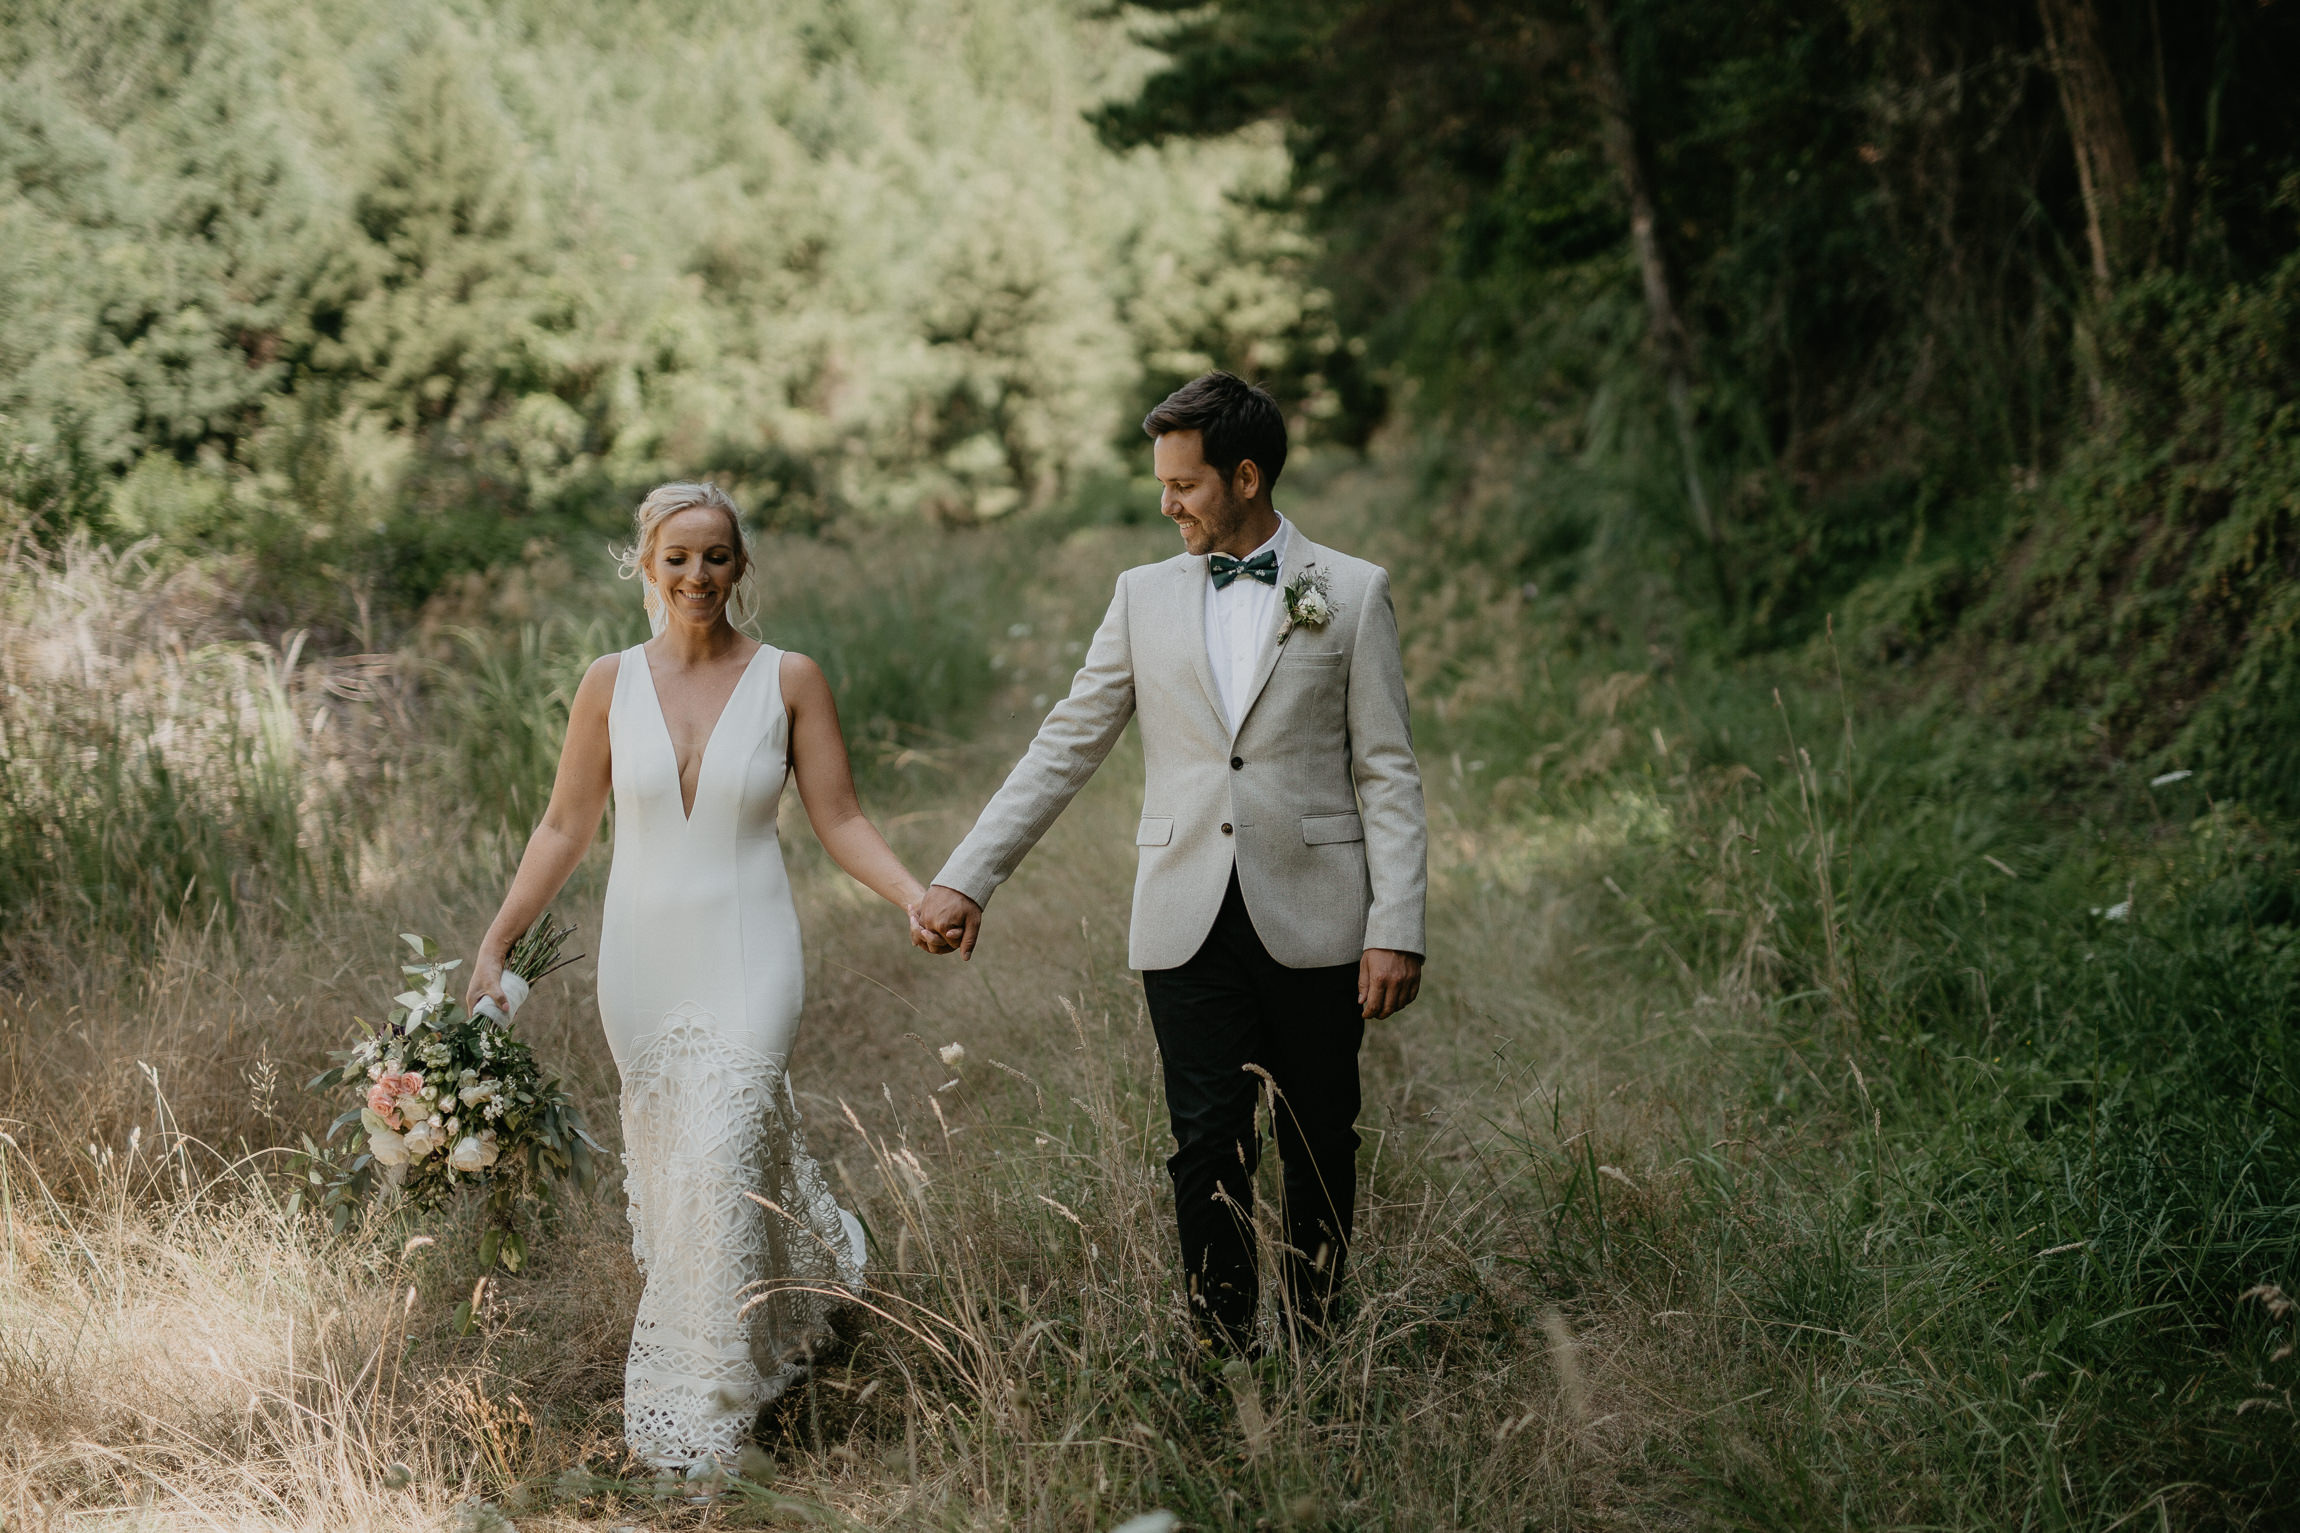 oldforestschool-wedding-blog-85.jpg